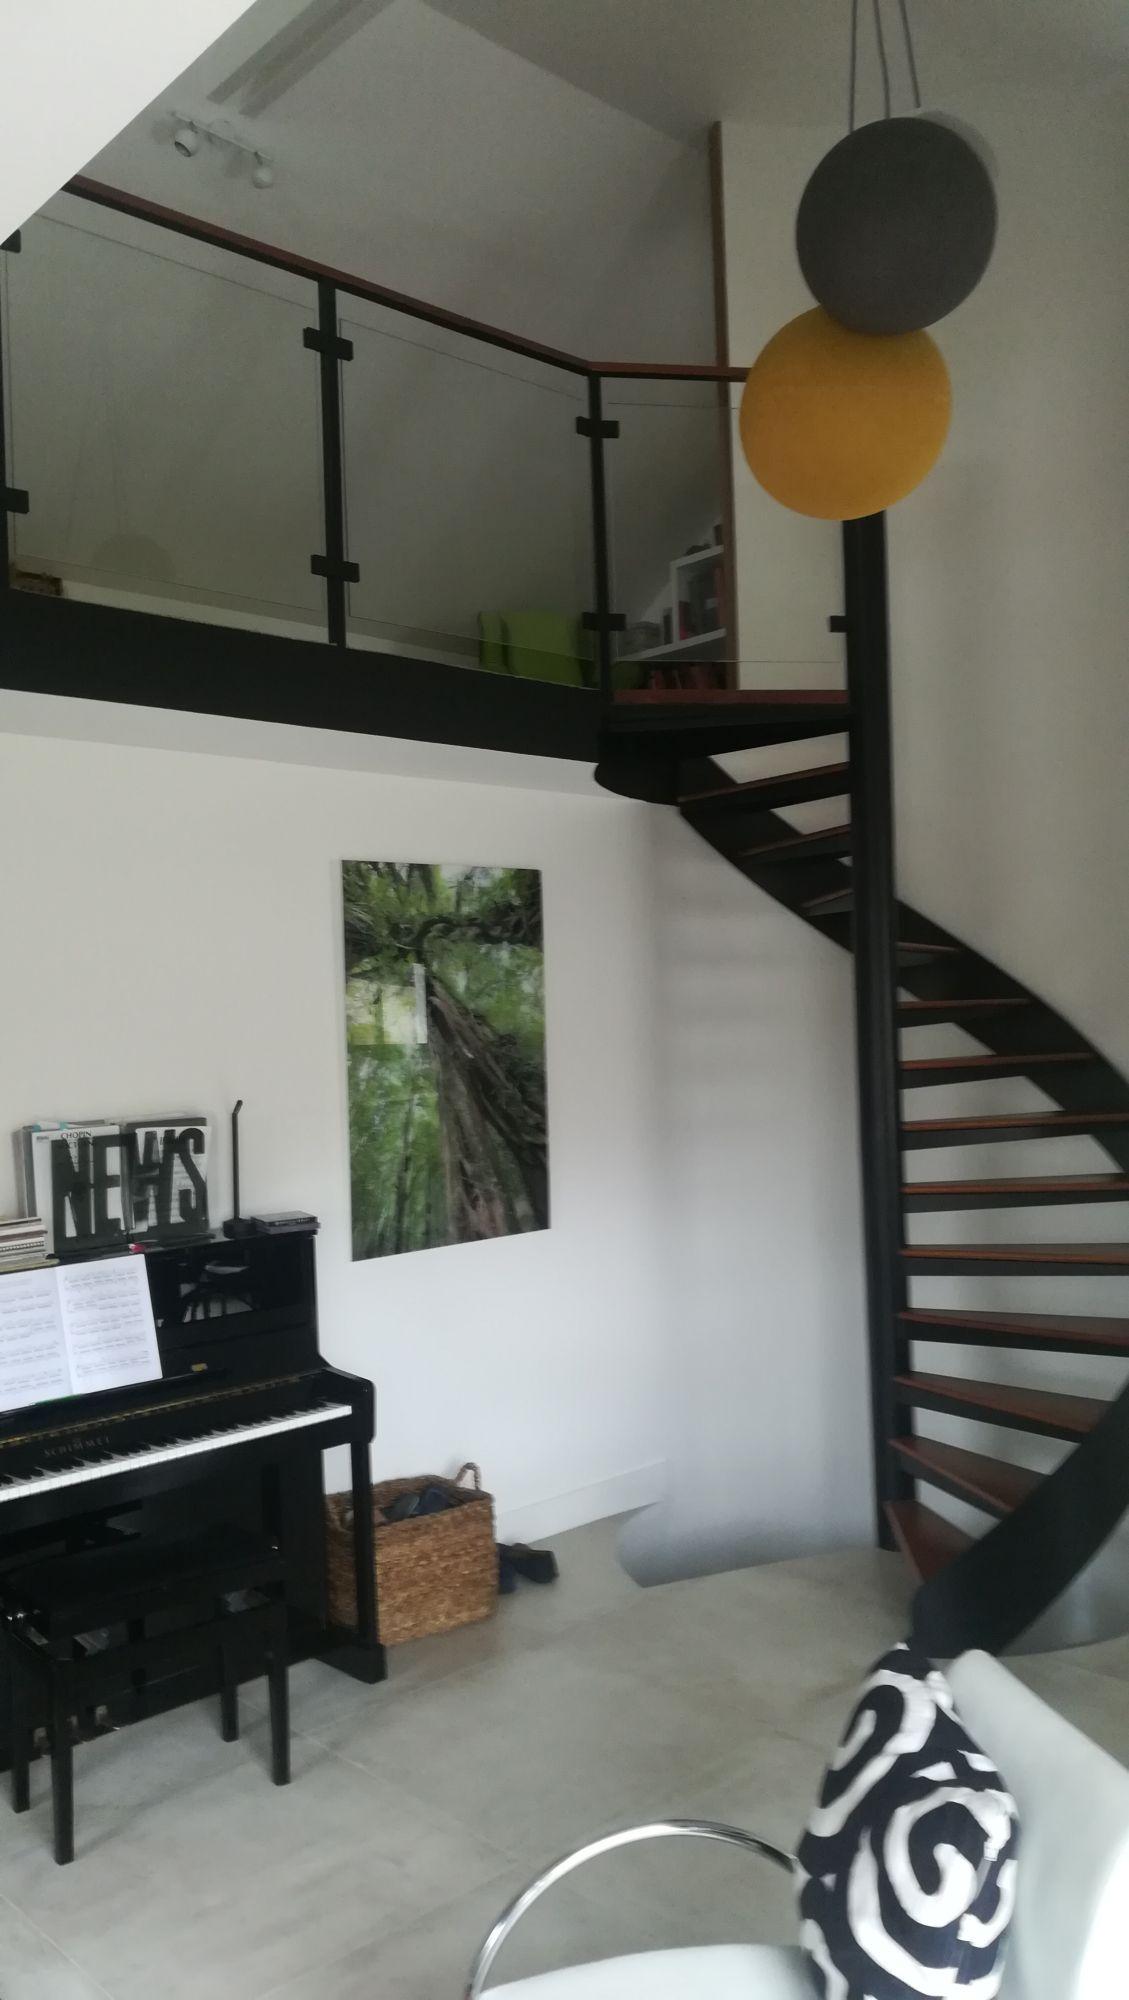 escalier-acir-le-val-st-pere